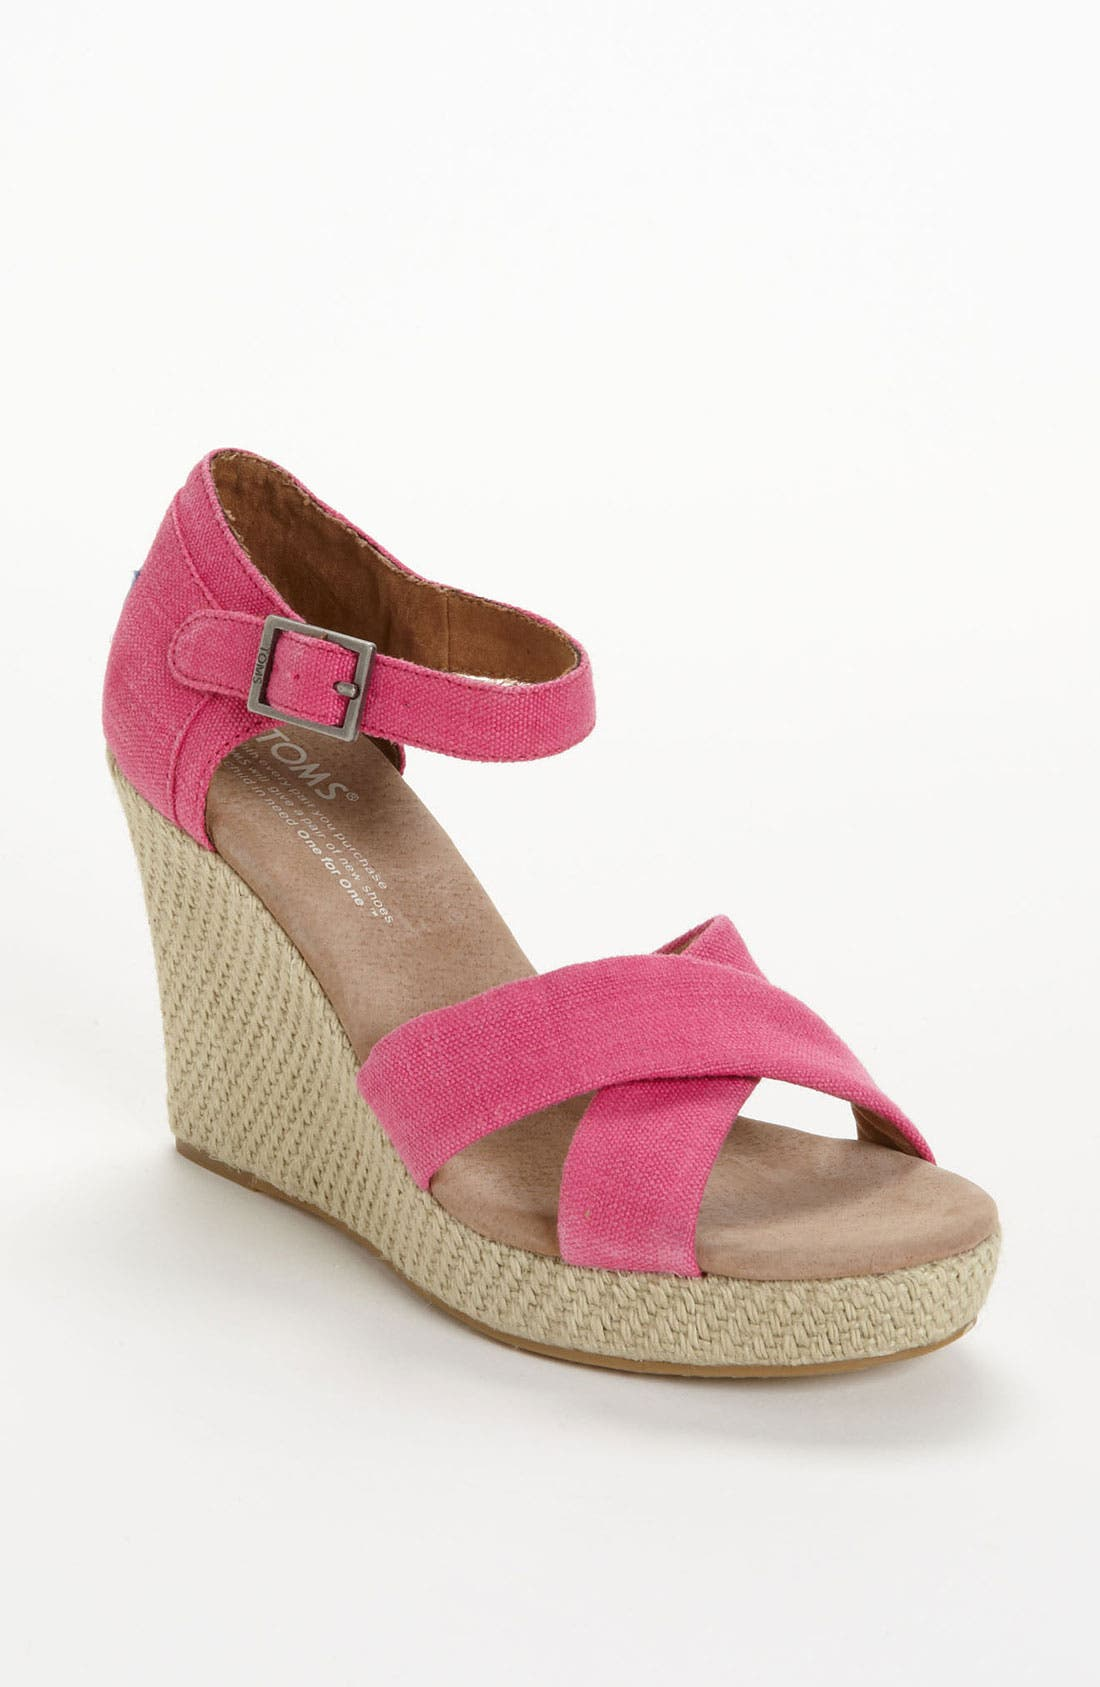 Main Image - TOMS Hemp Wedge Sandal